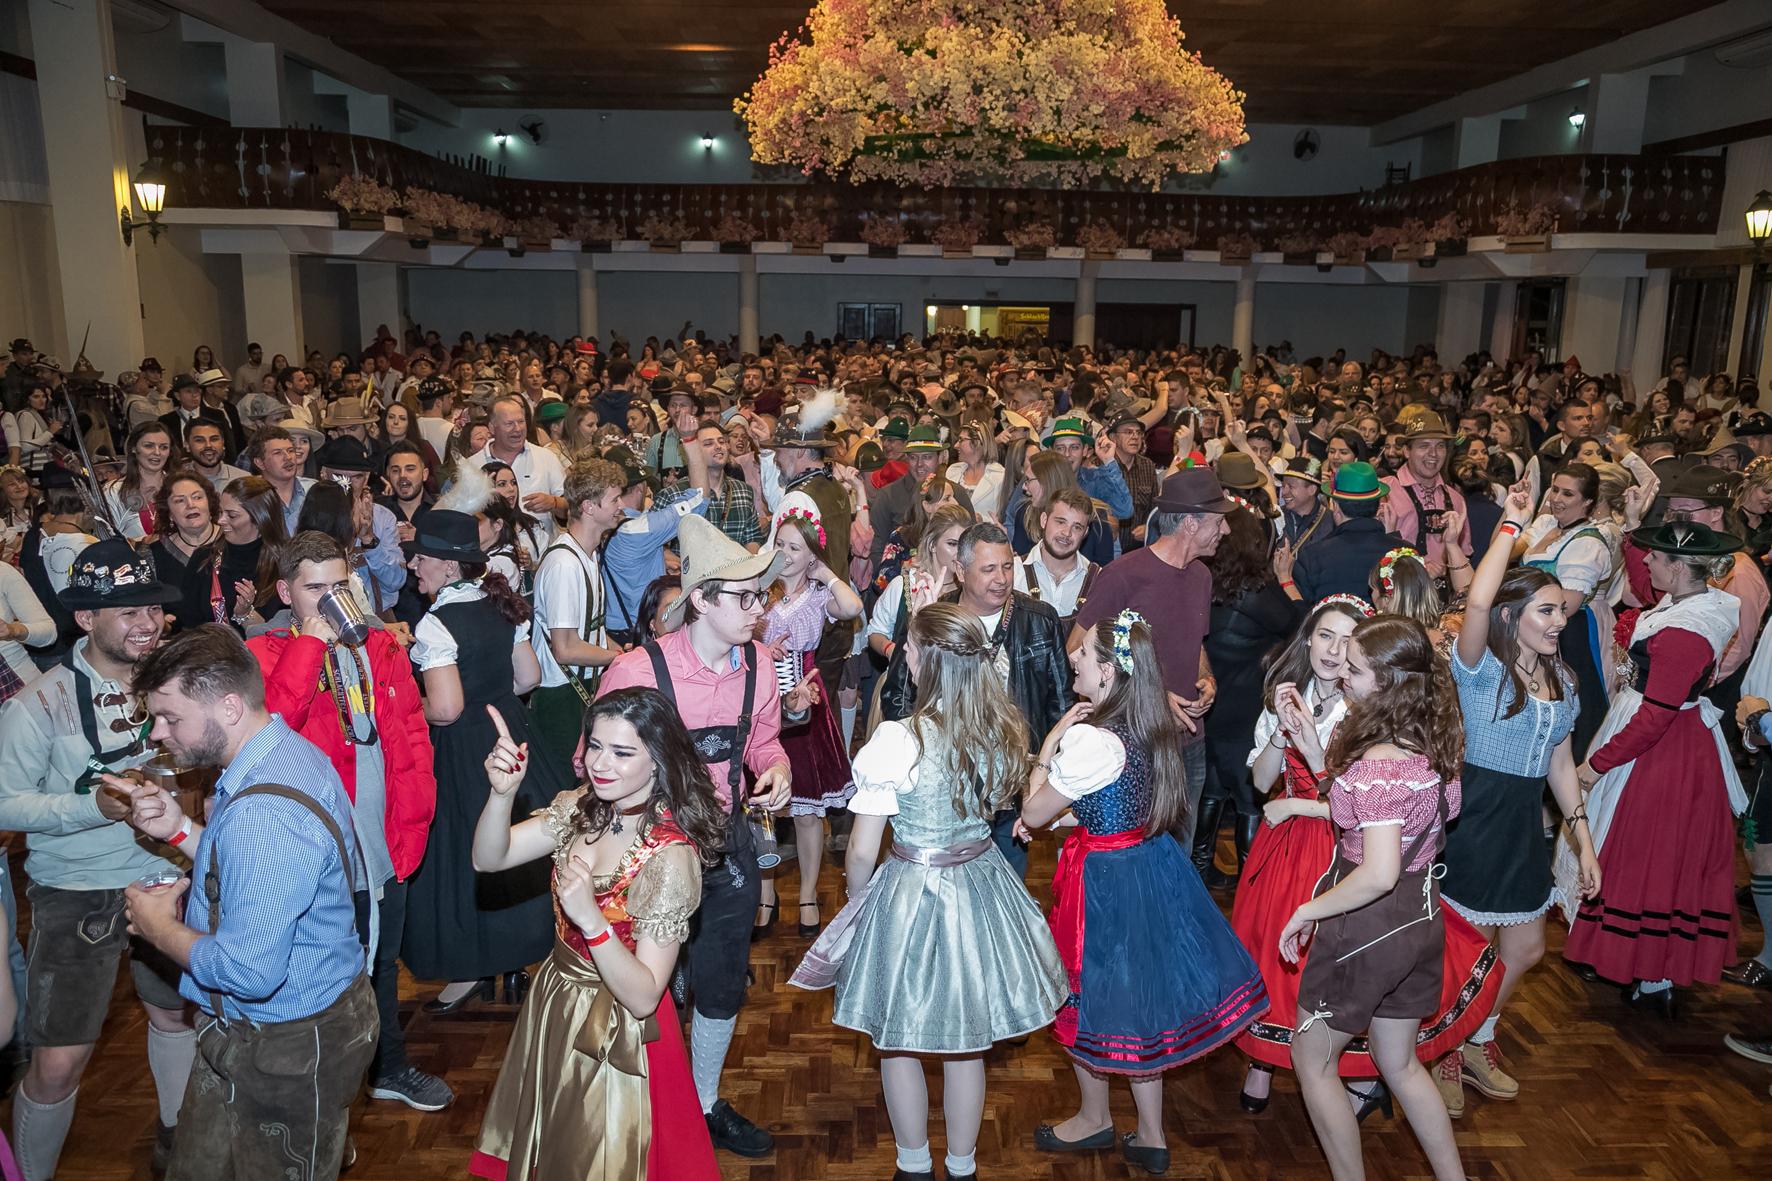 Schalachtfest inicia festas catarinenses